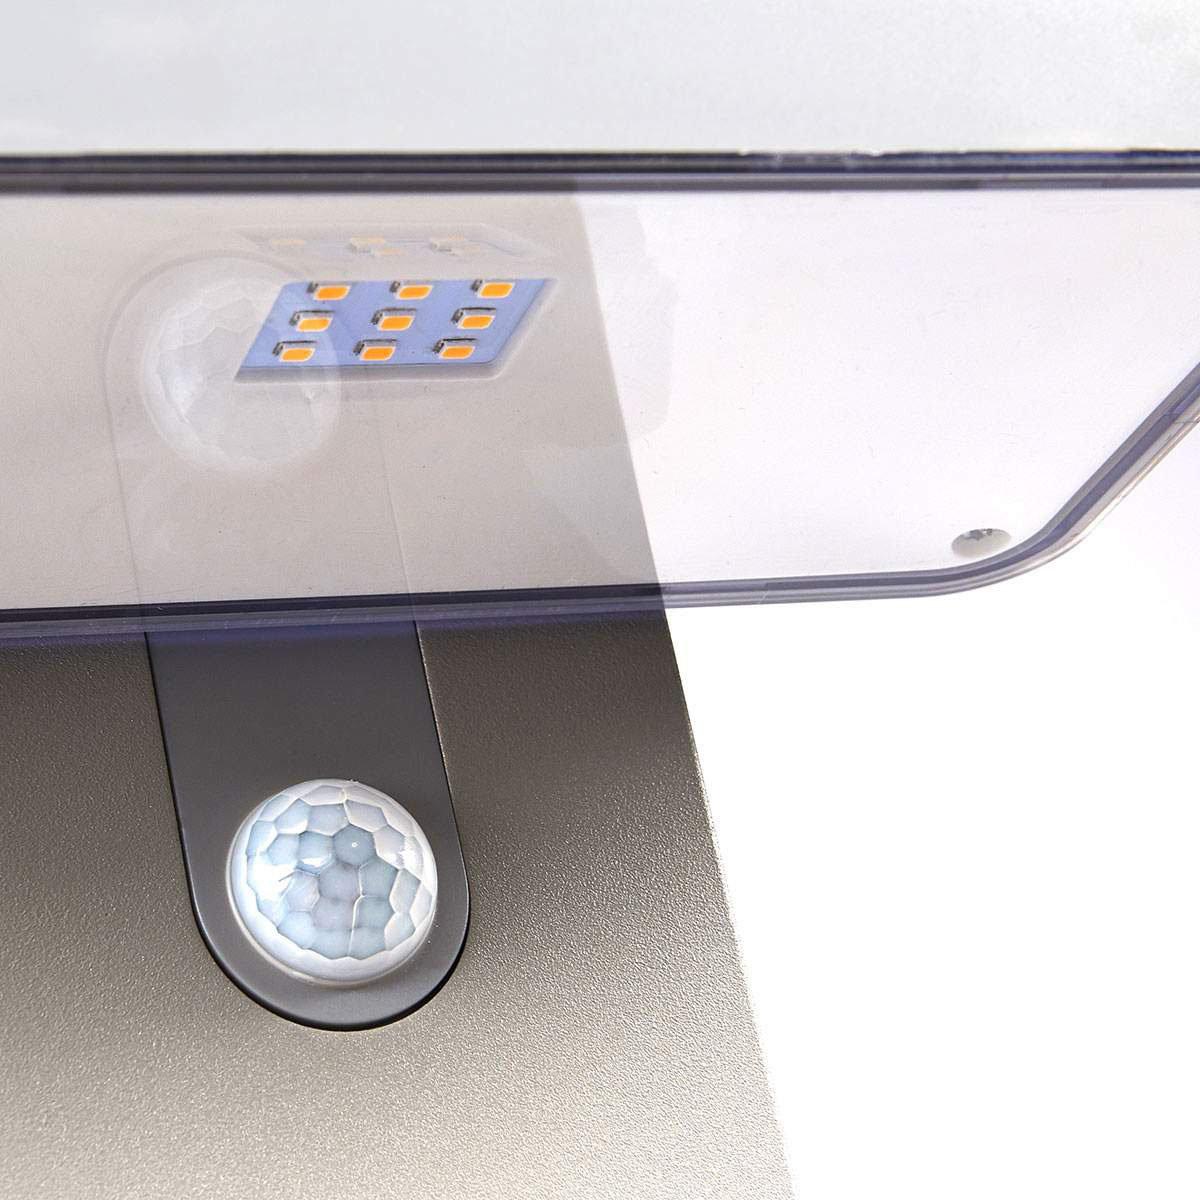 LED-Sockelleuchte Maik mit Bewegungsmelder, 60x18x13 cm, Kunststoff,  grau | #7